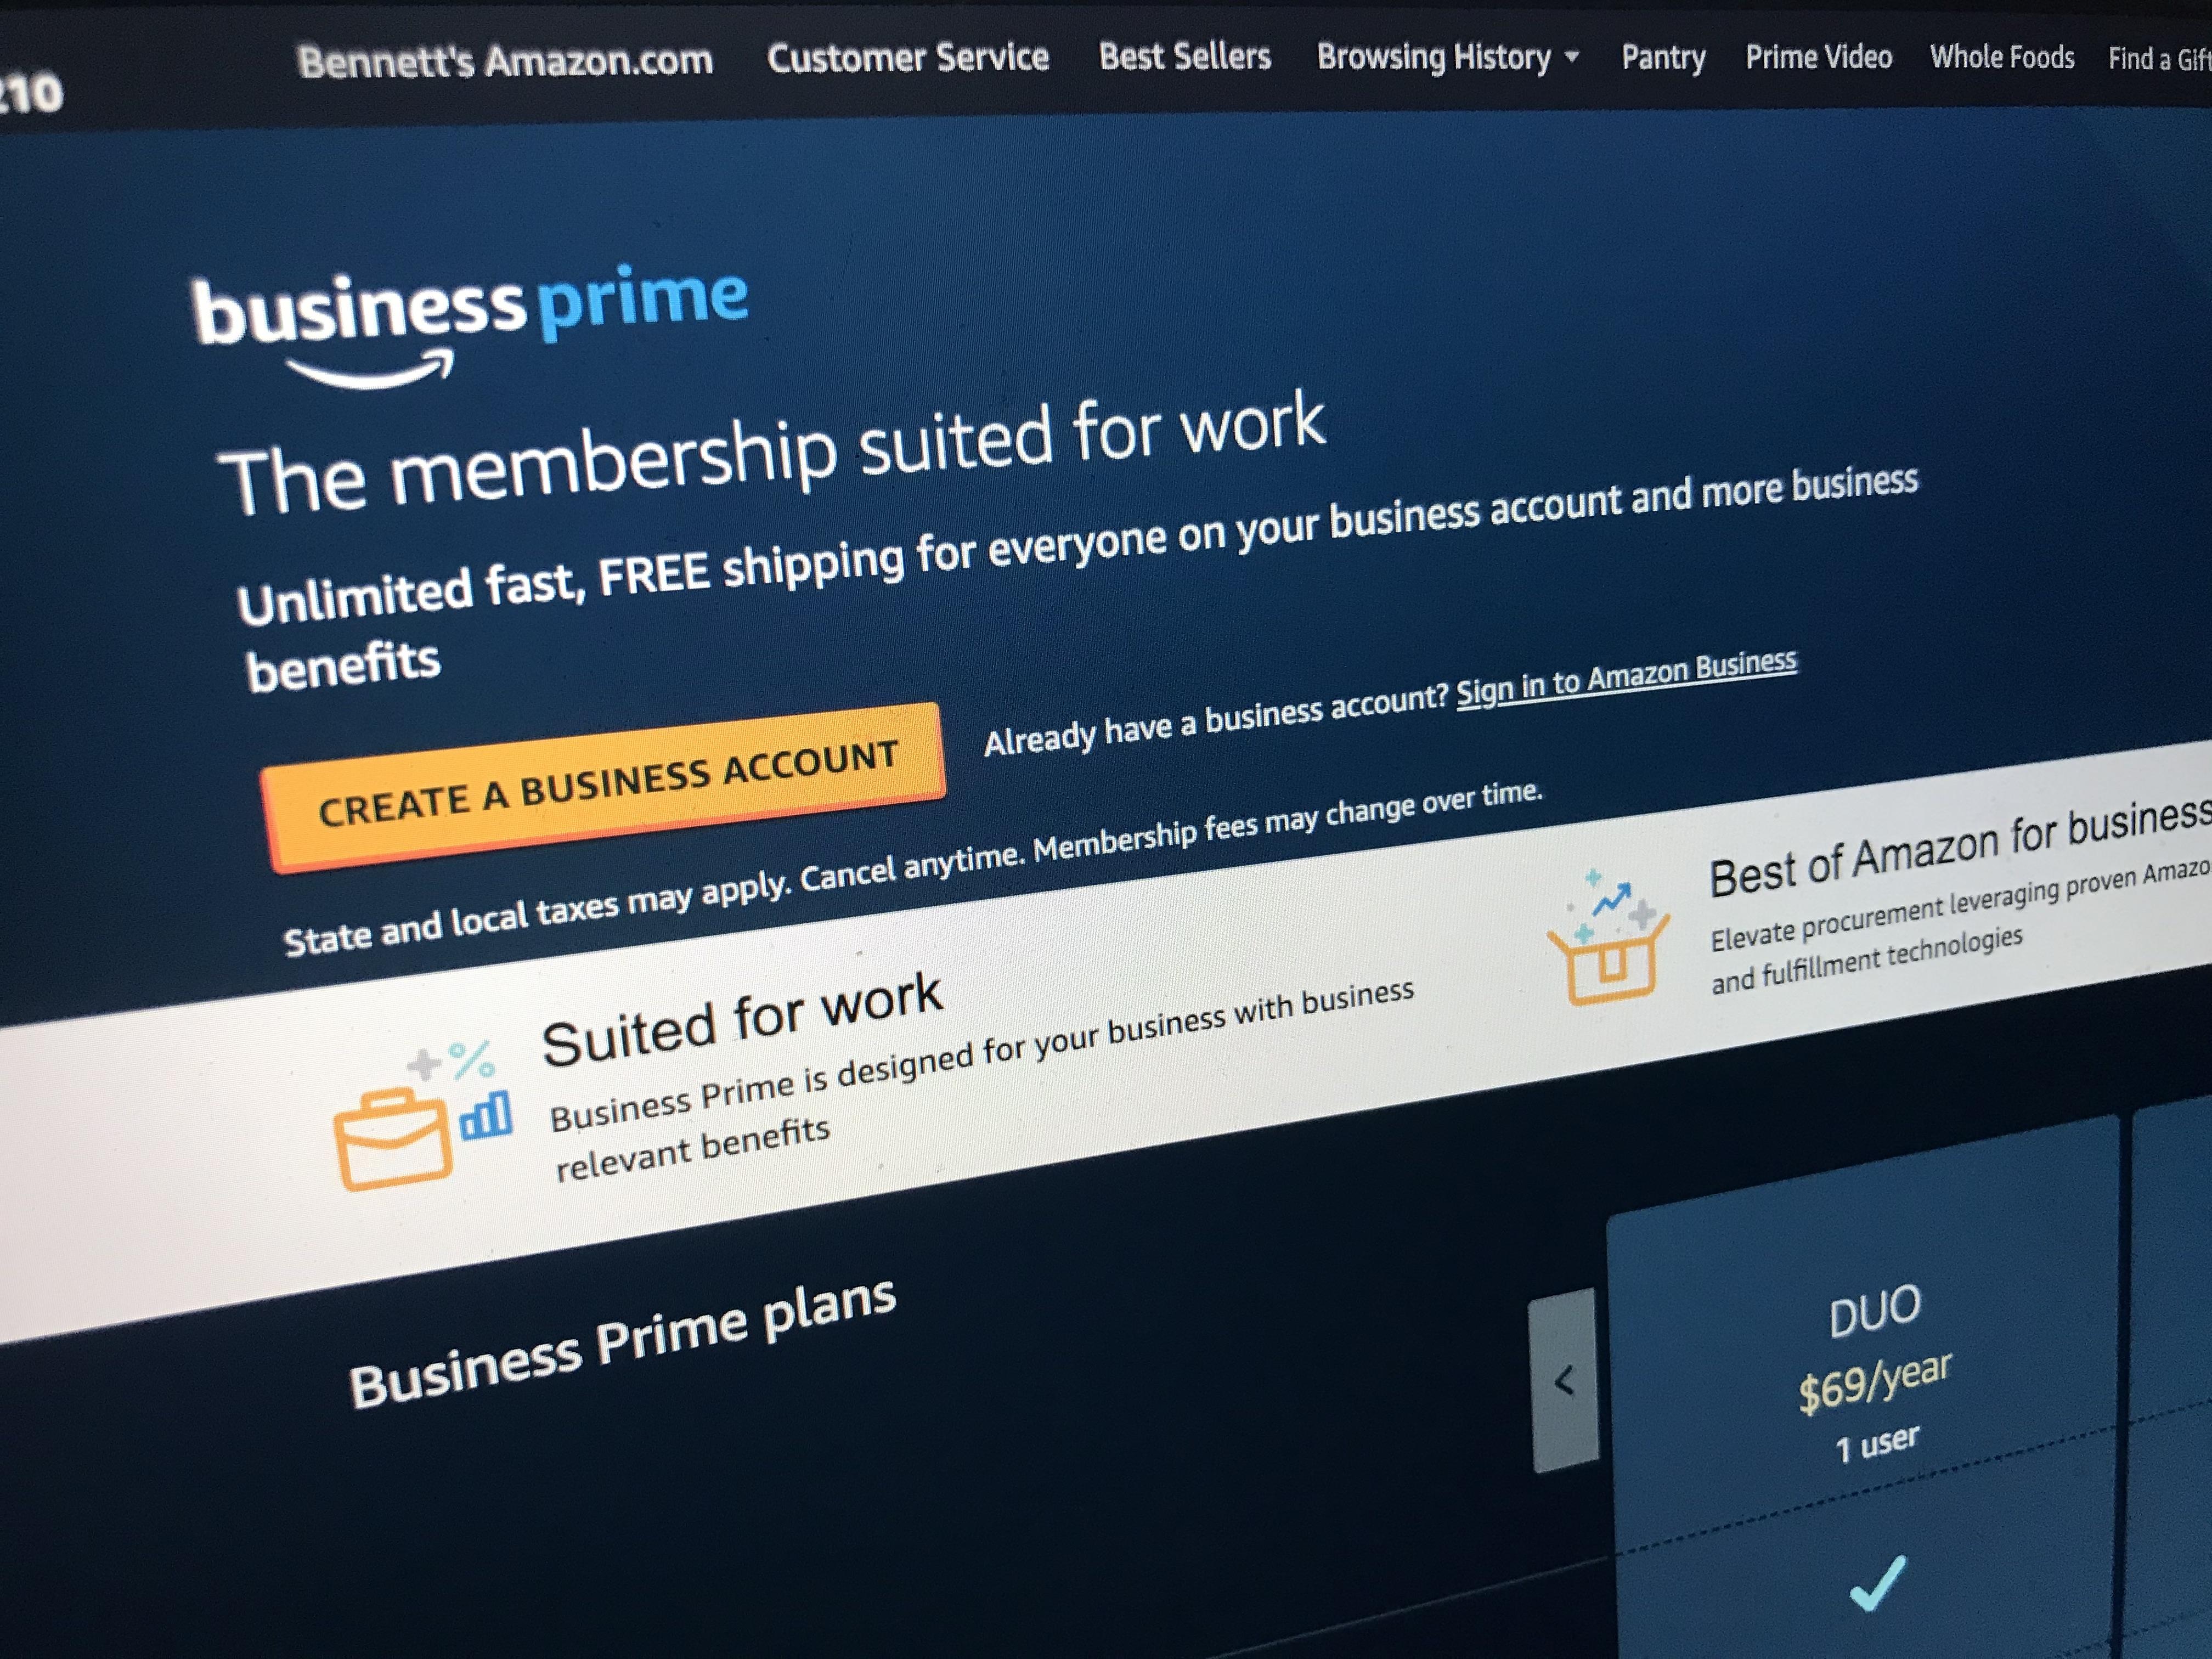 amazon business account details